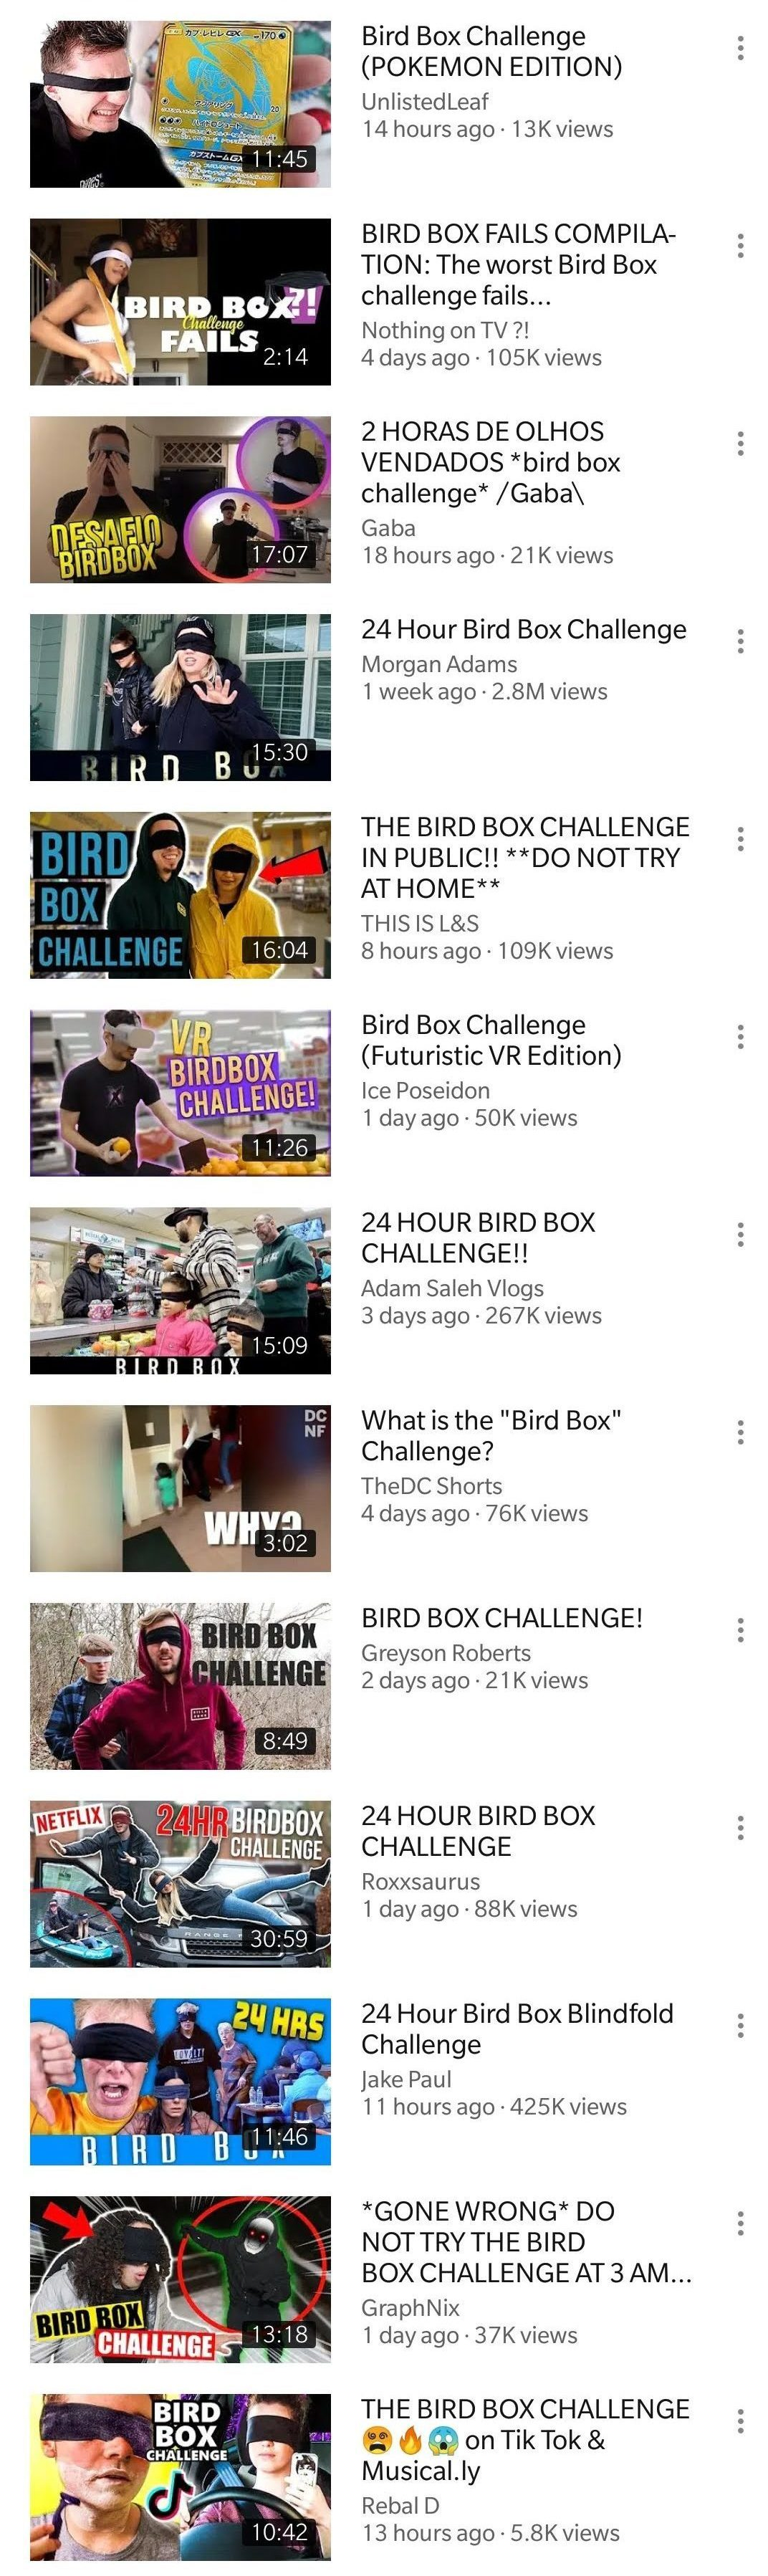 Bird box Challege on Youtube